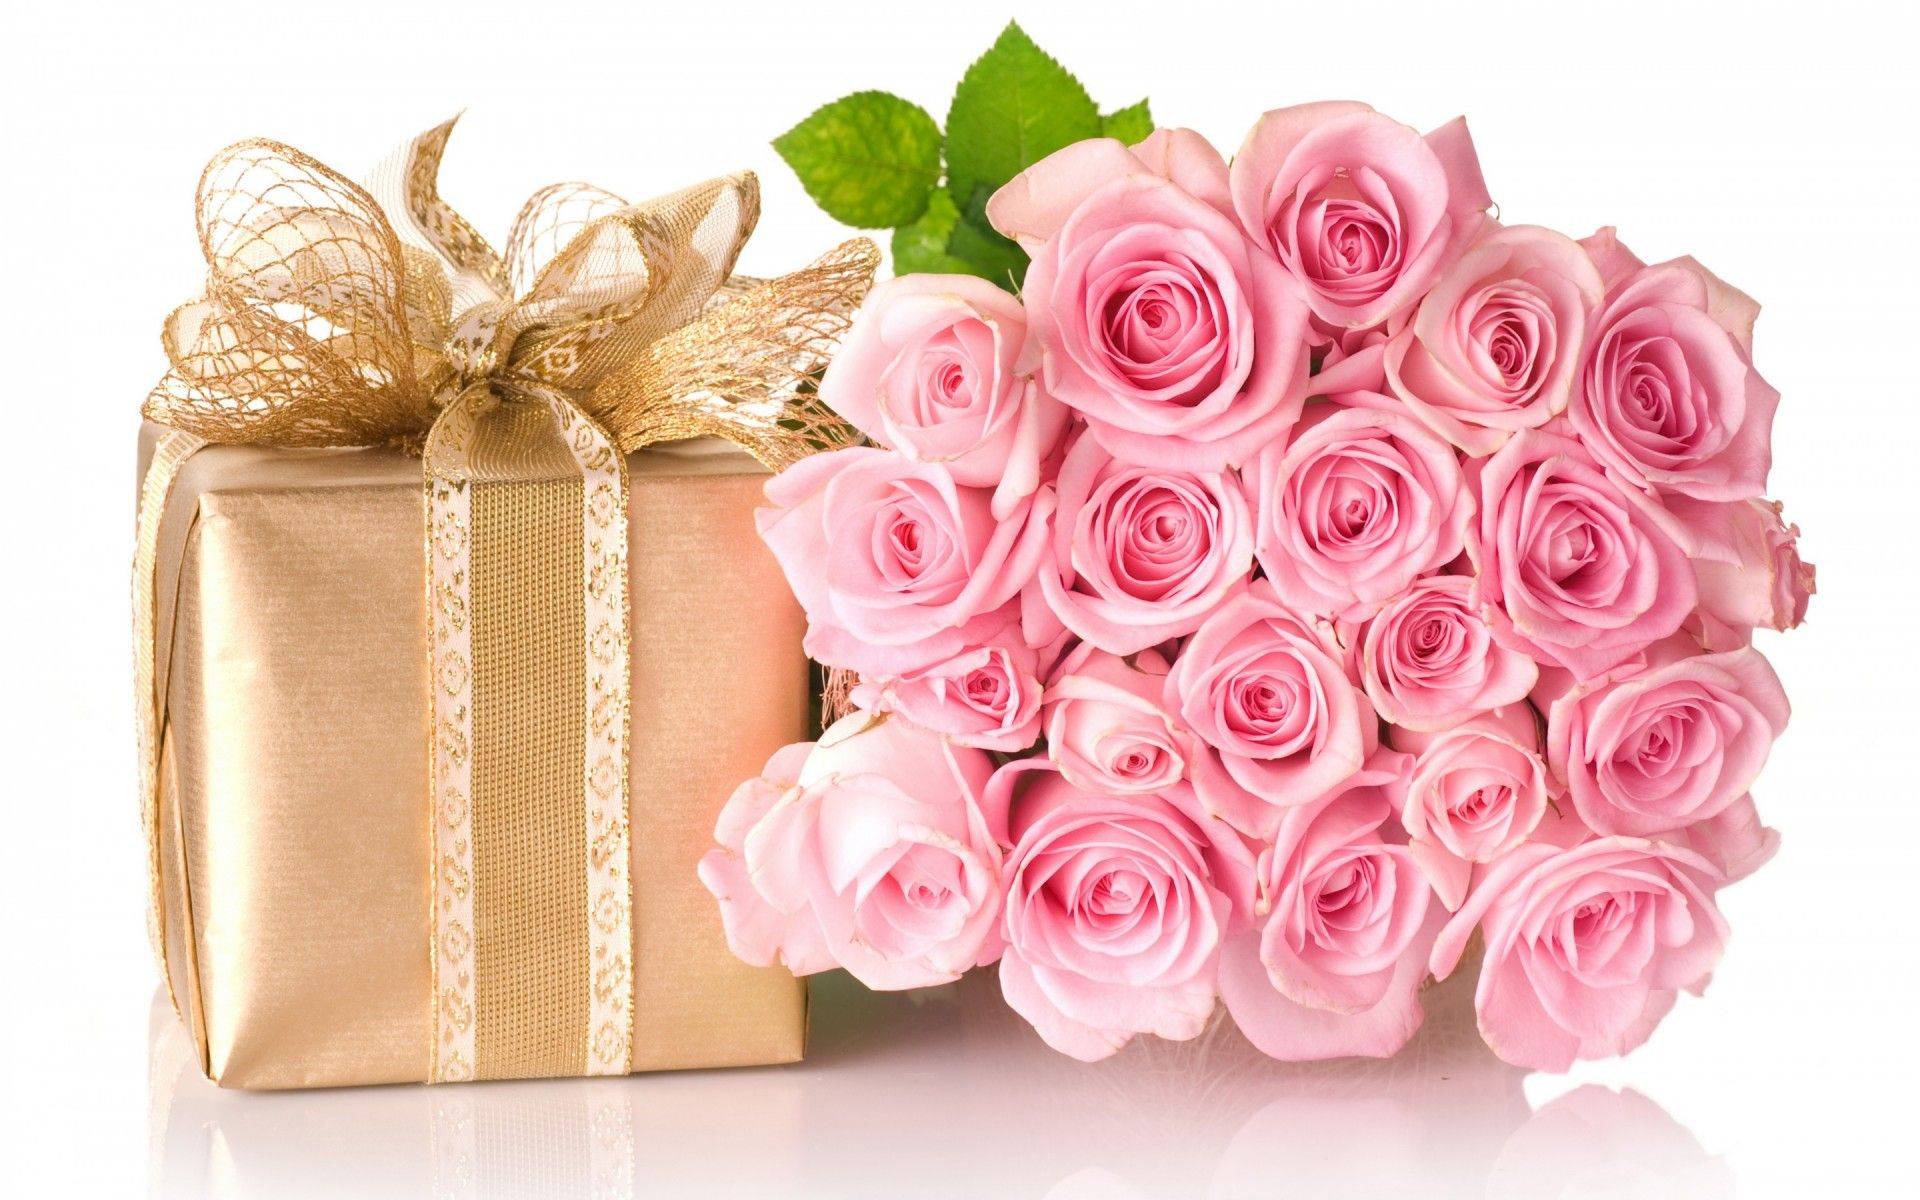 happy birthday roses bouquet wallpaper hd    imashon